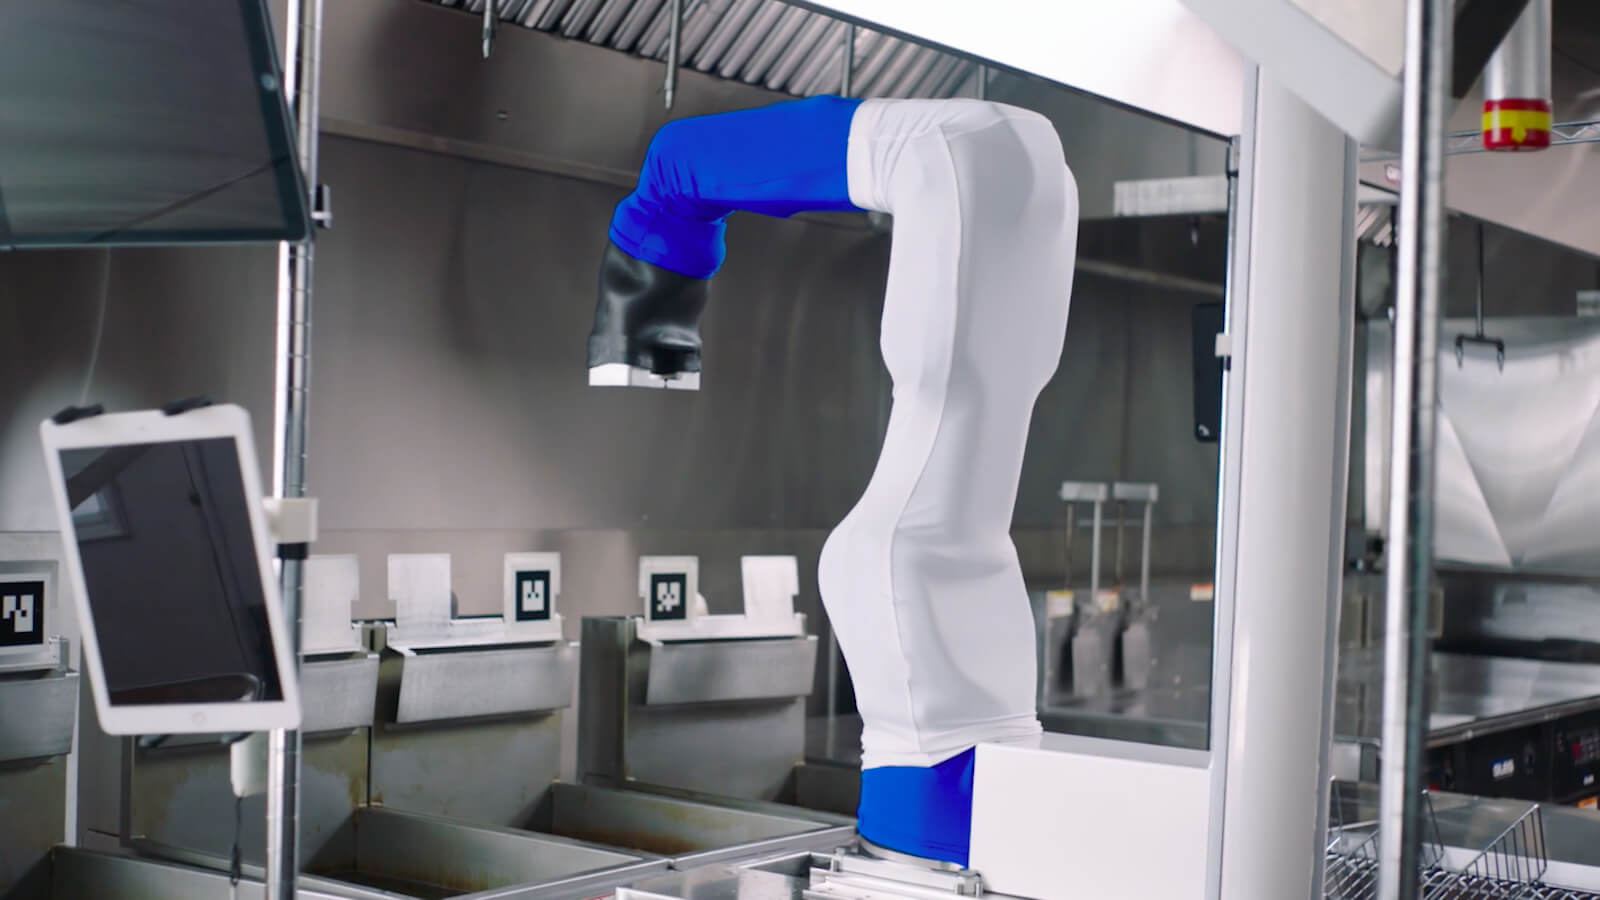 Miso Robotics Flippy Robot Kitchen Assistant